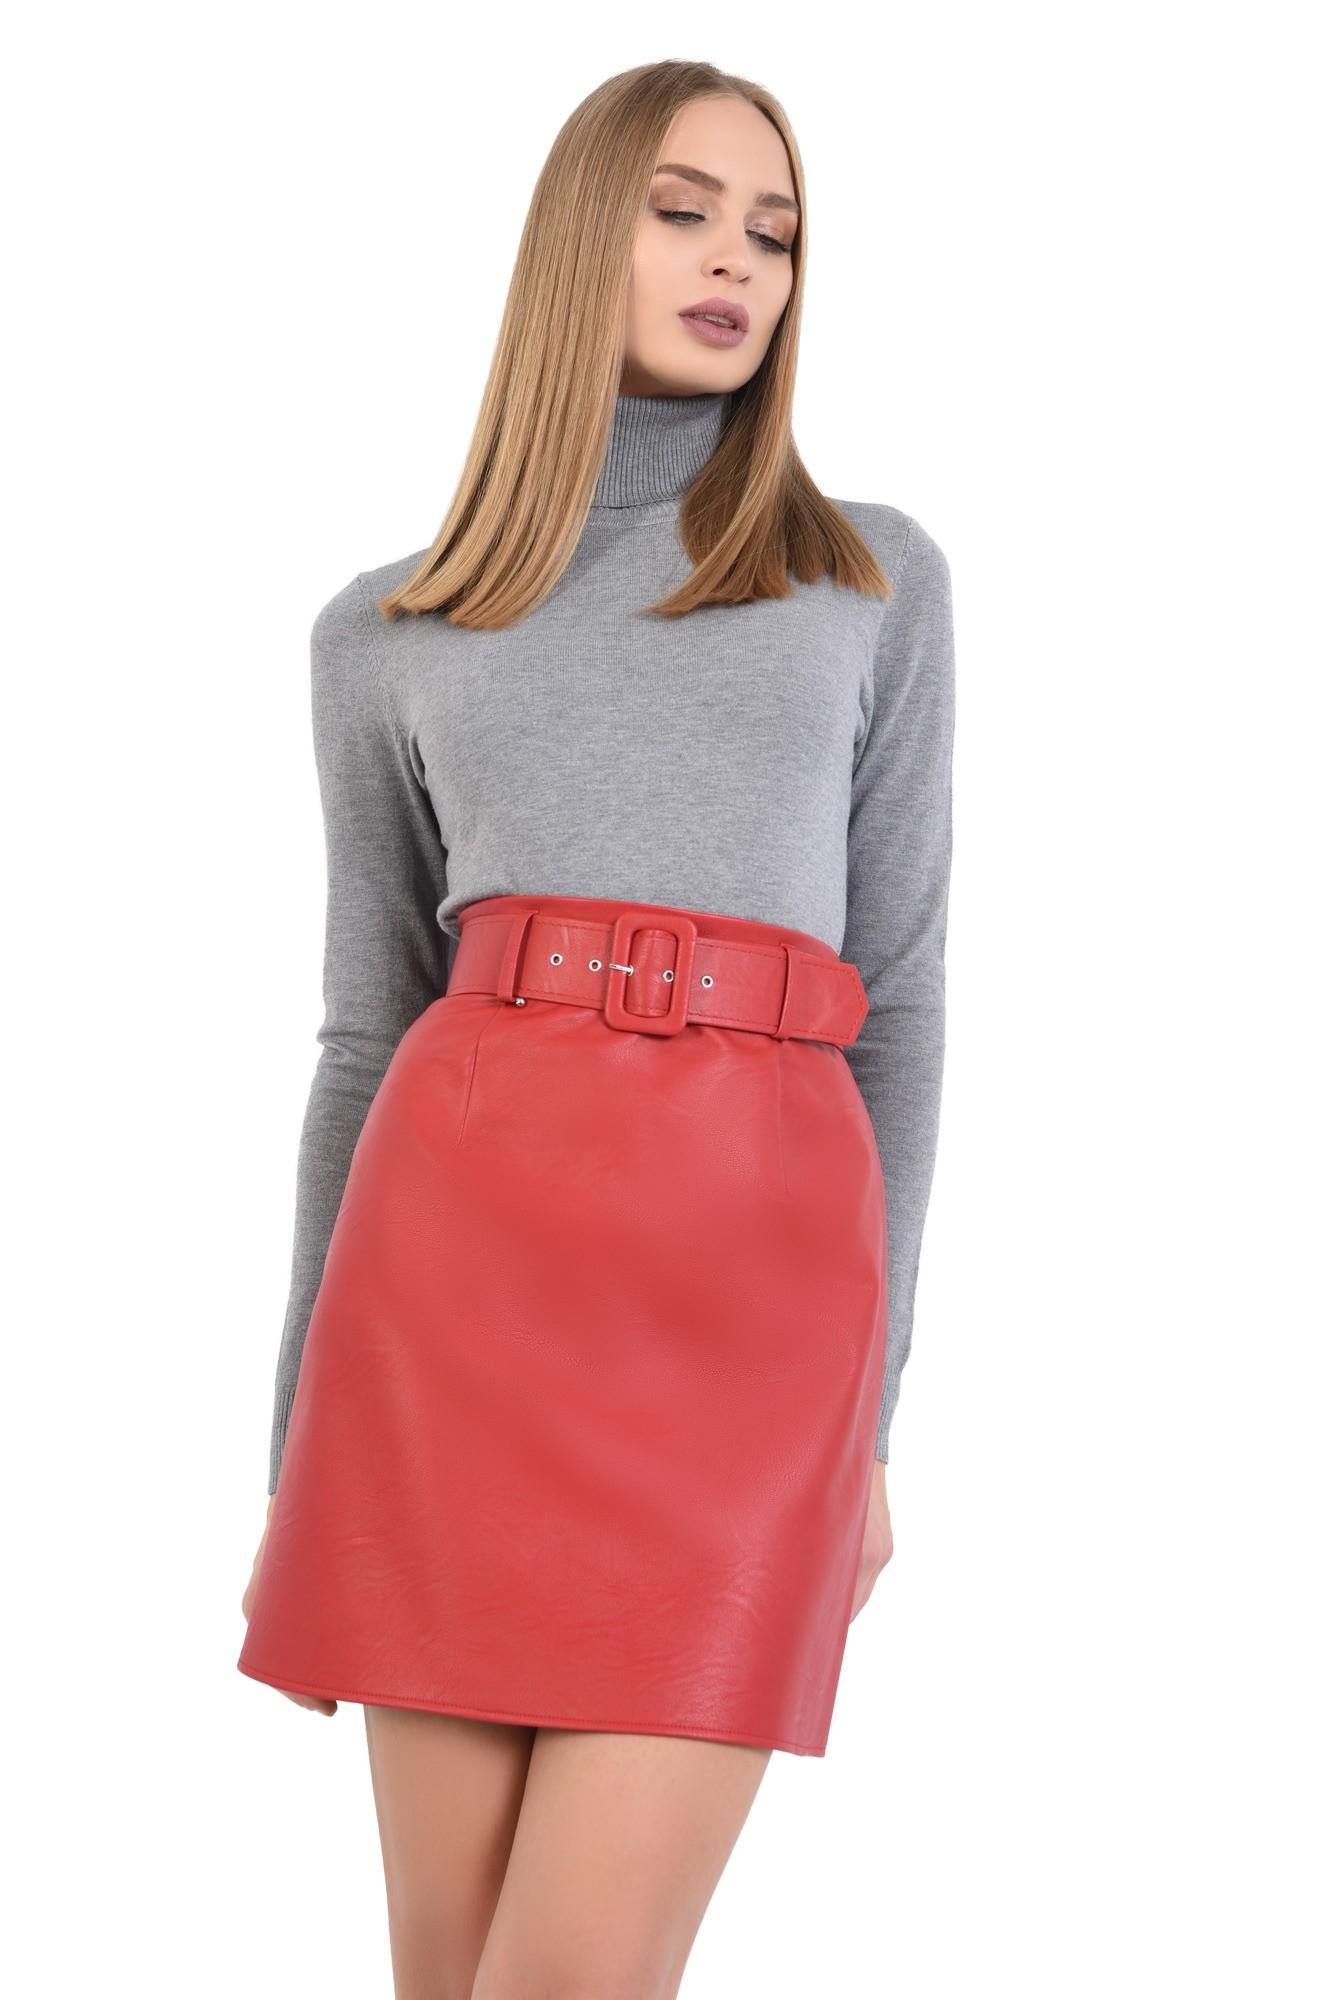 pulover tip maleta, gri, borduri reiate, guler inalt, bluza tricotata